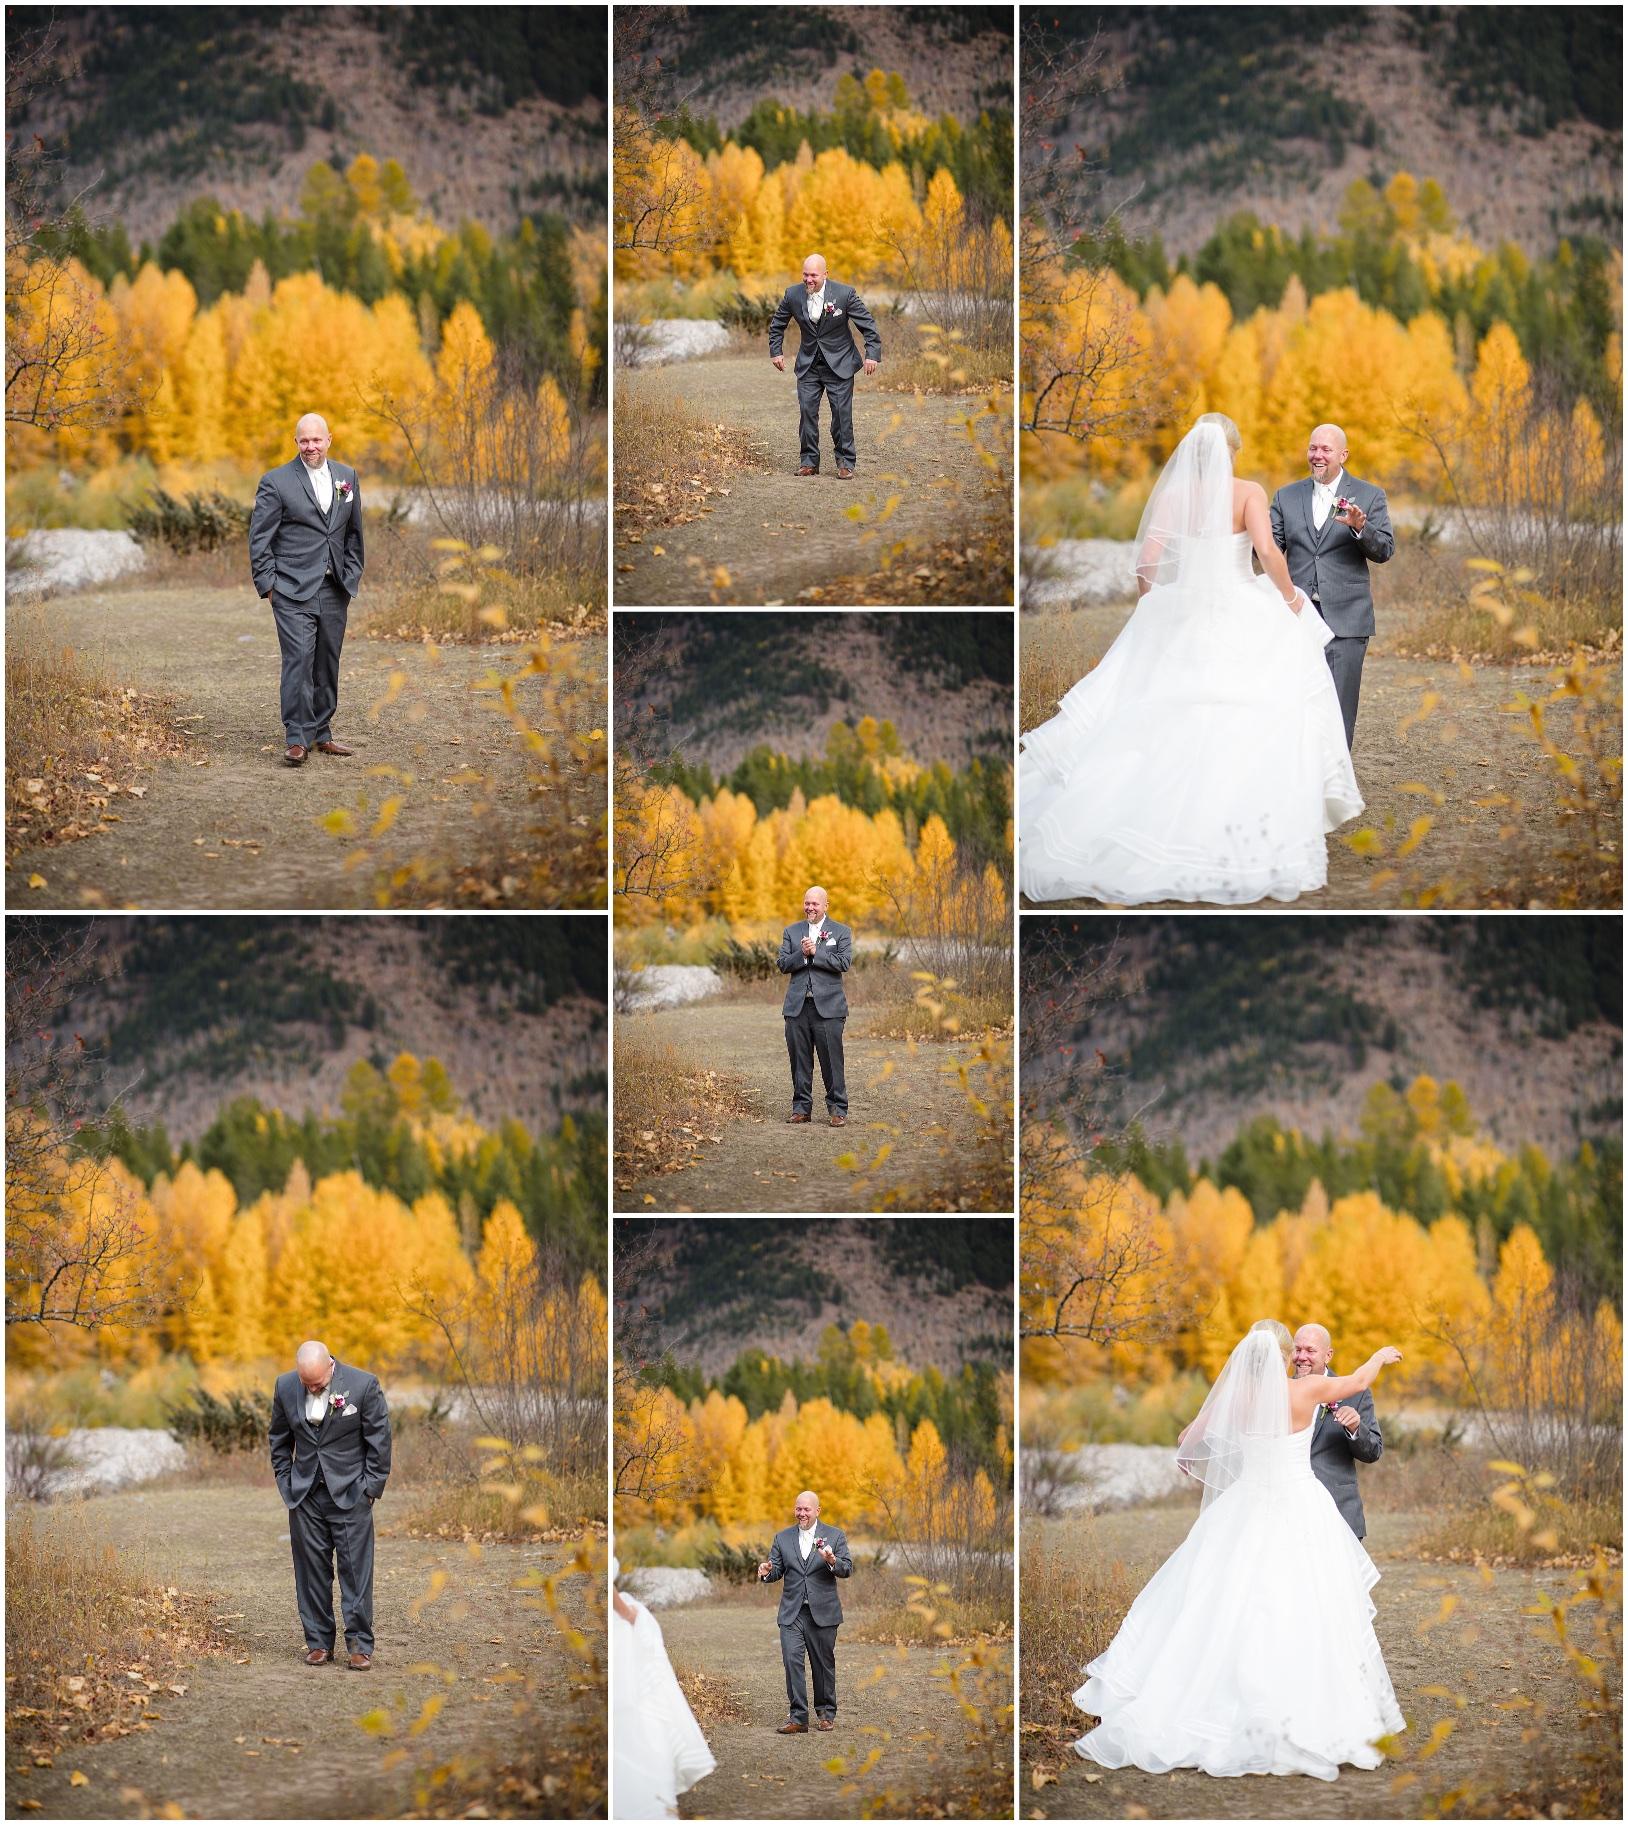 lindseyjane_wedding013.jpg